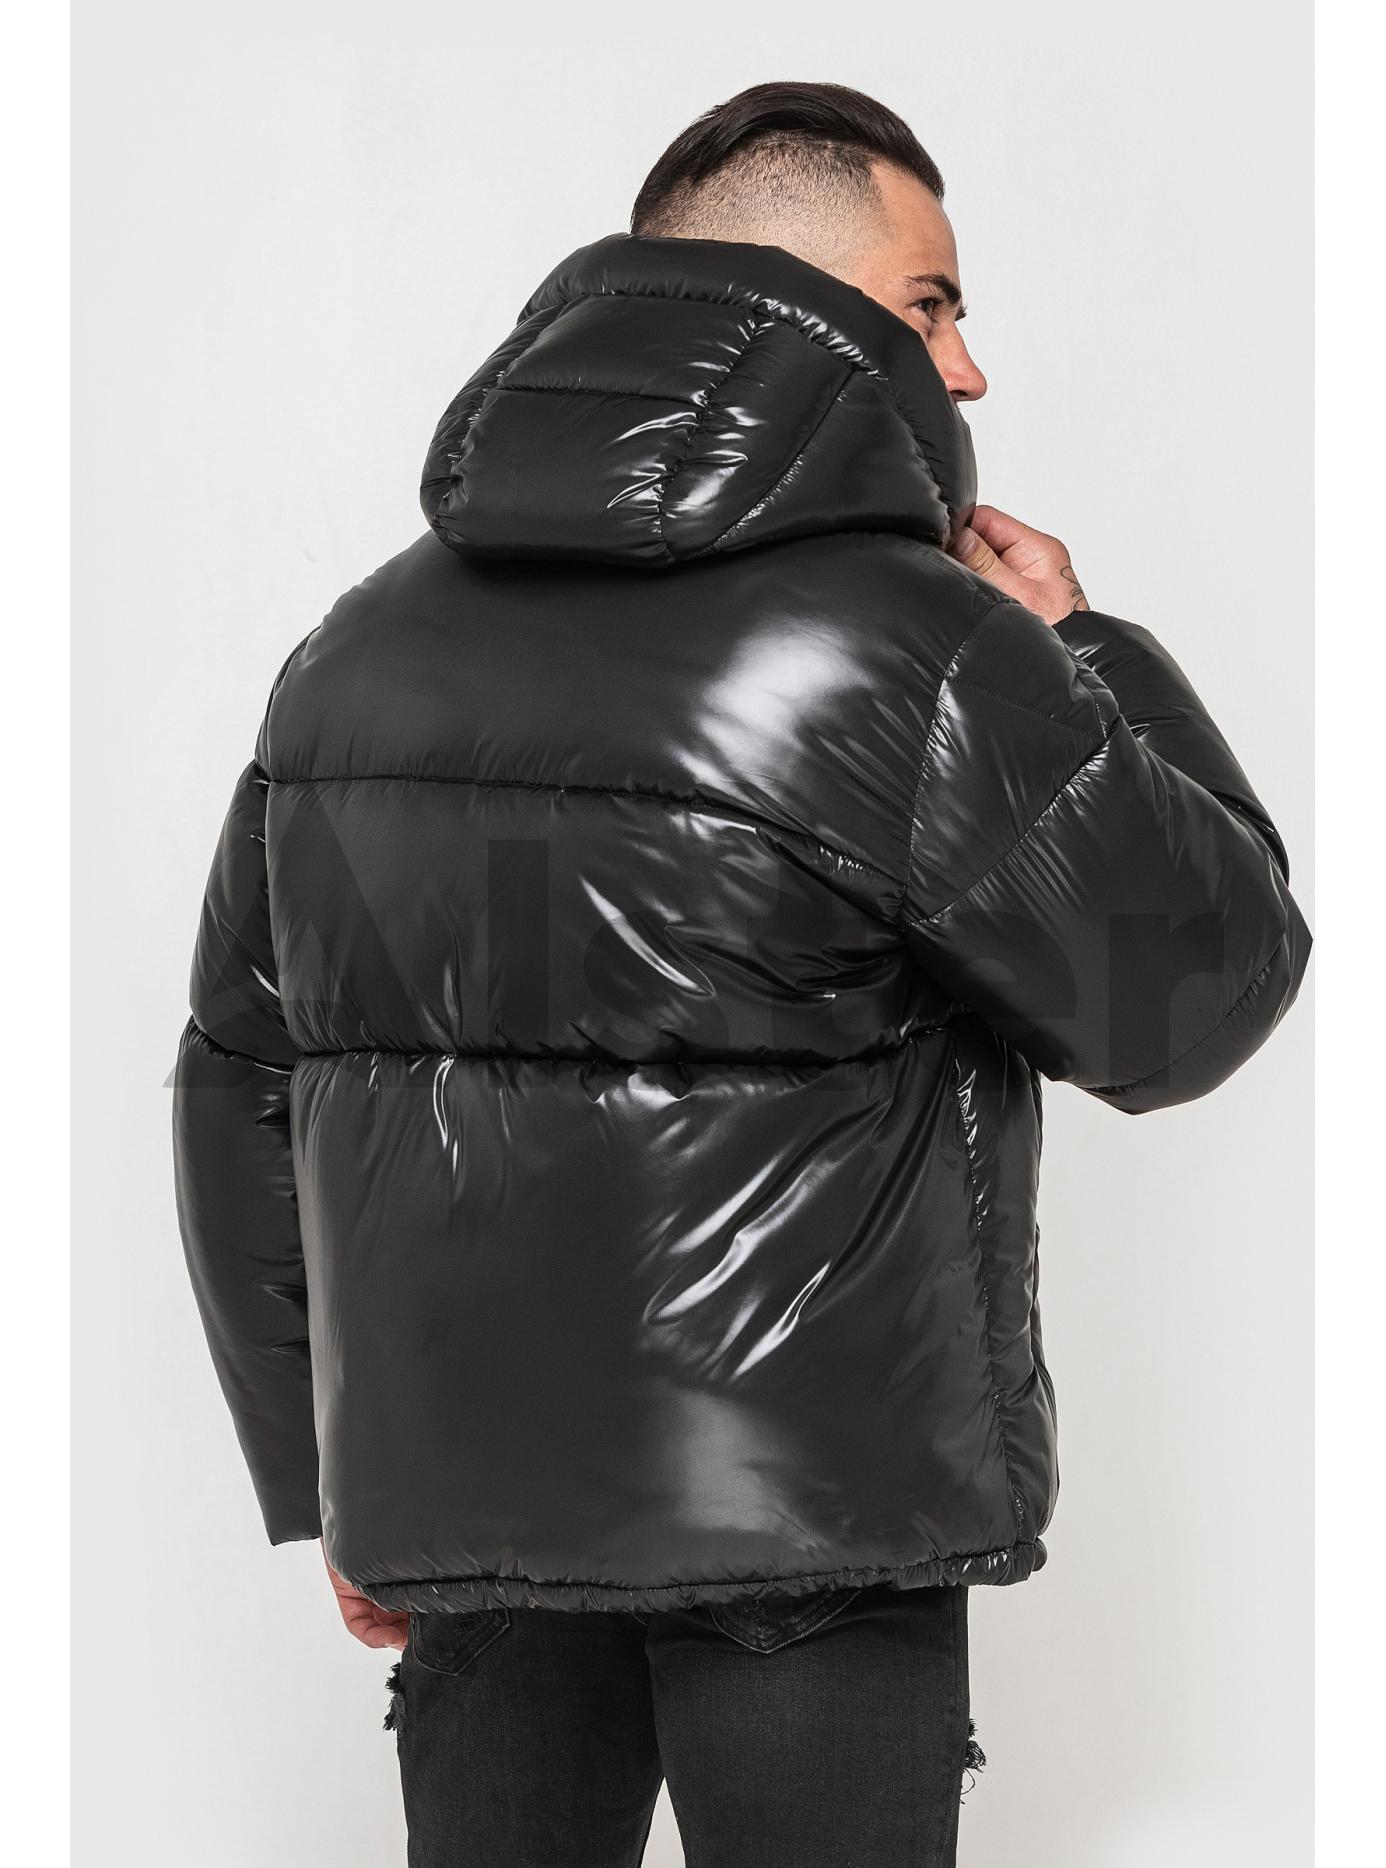 Куртка чоловіча зимова Т-362 Чорний 48 (02-MT21080): фото - Alster.ua